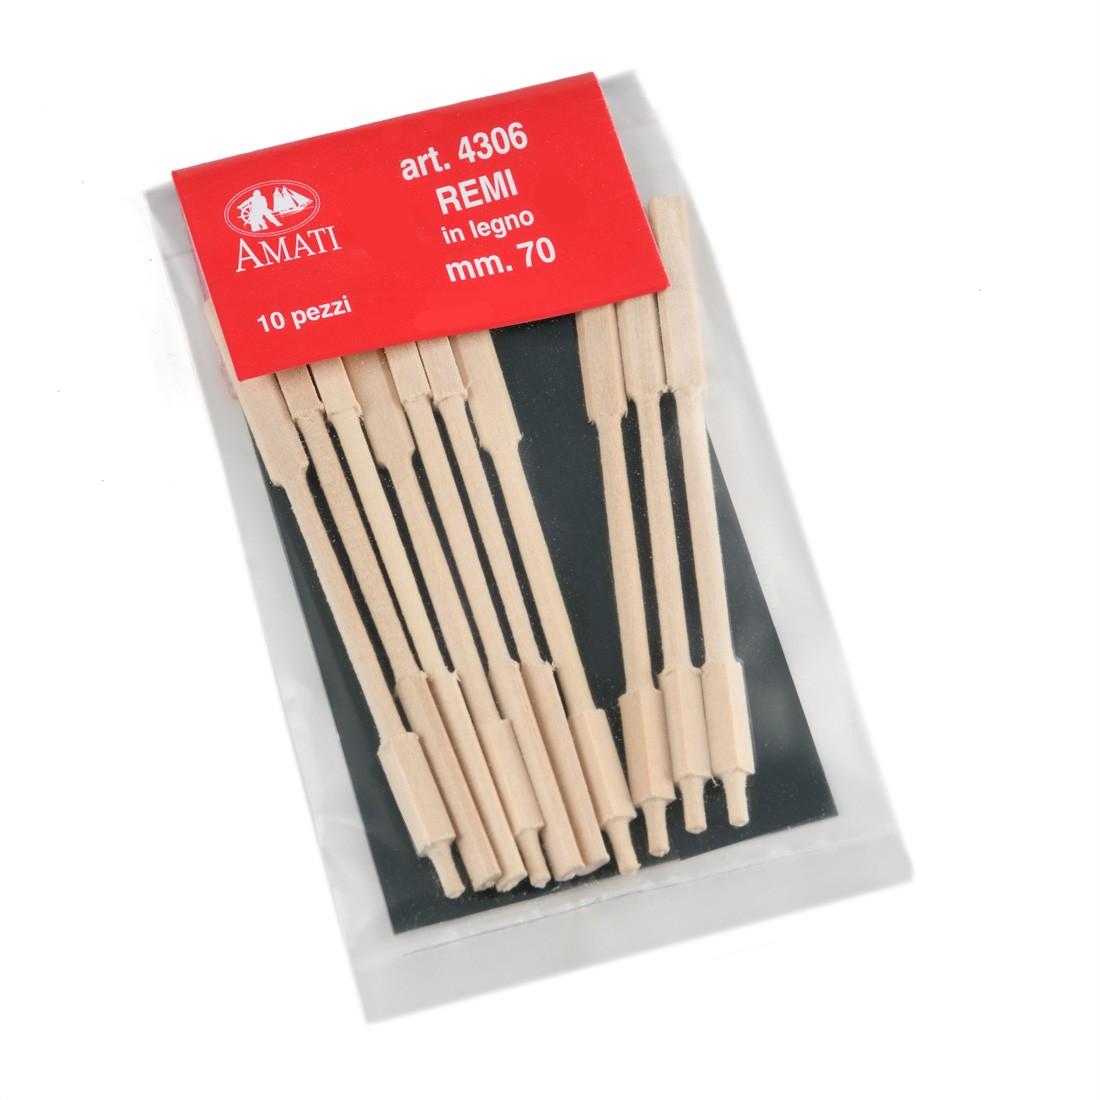 Remos de madera de longitud mm.70